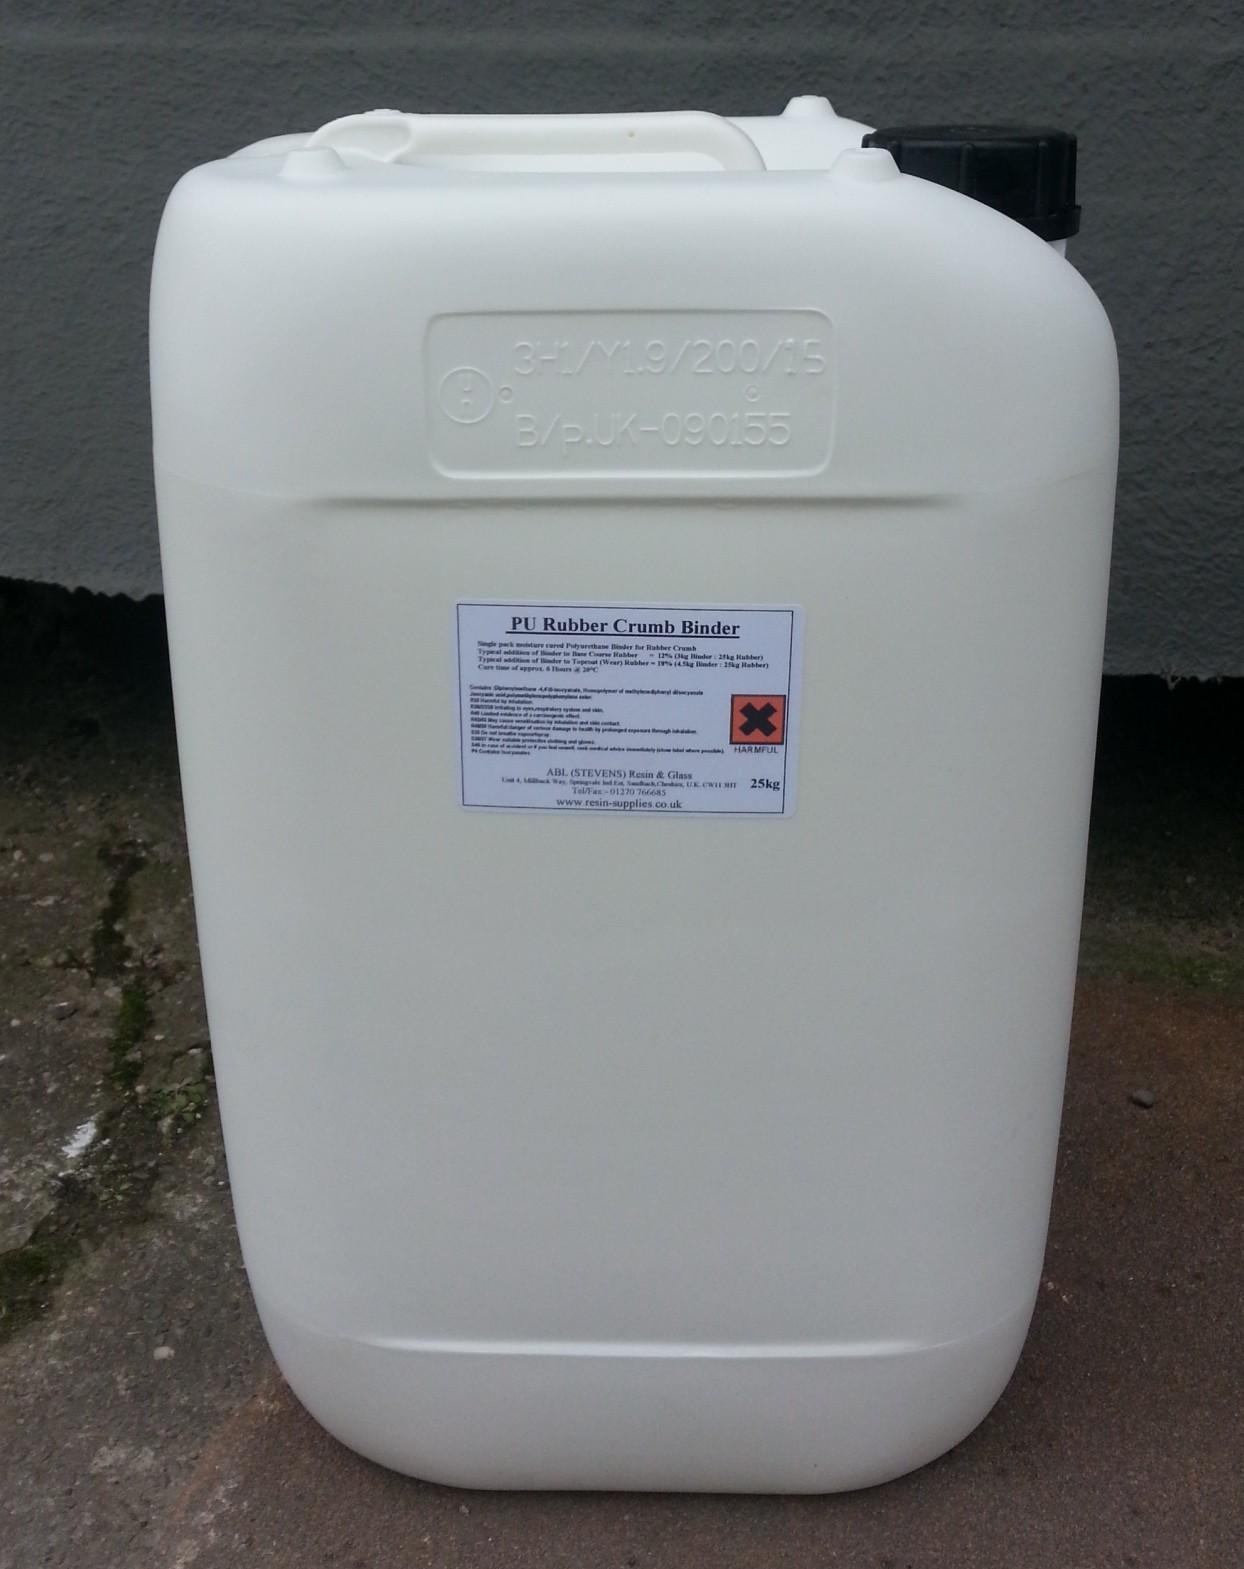 ABL Stevens - fibreglass repair, resin suppliers, polymer